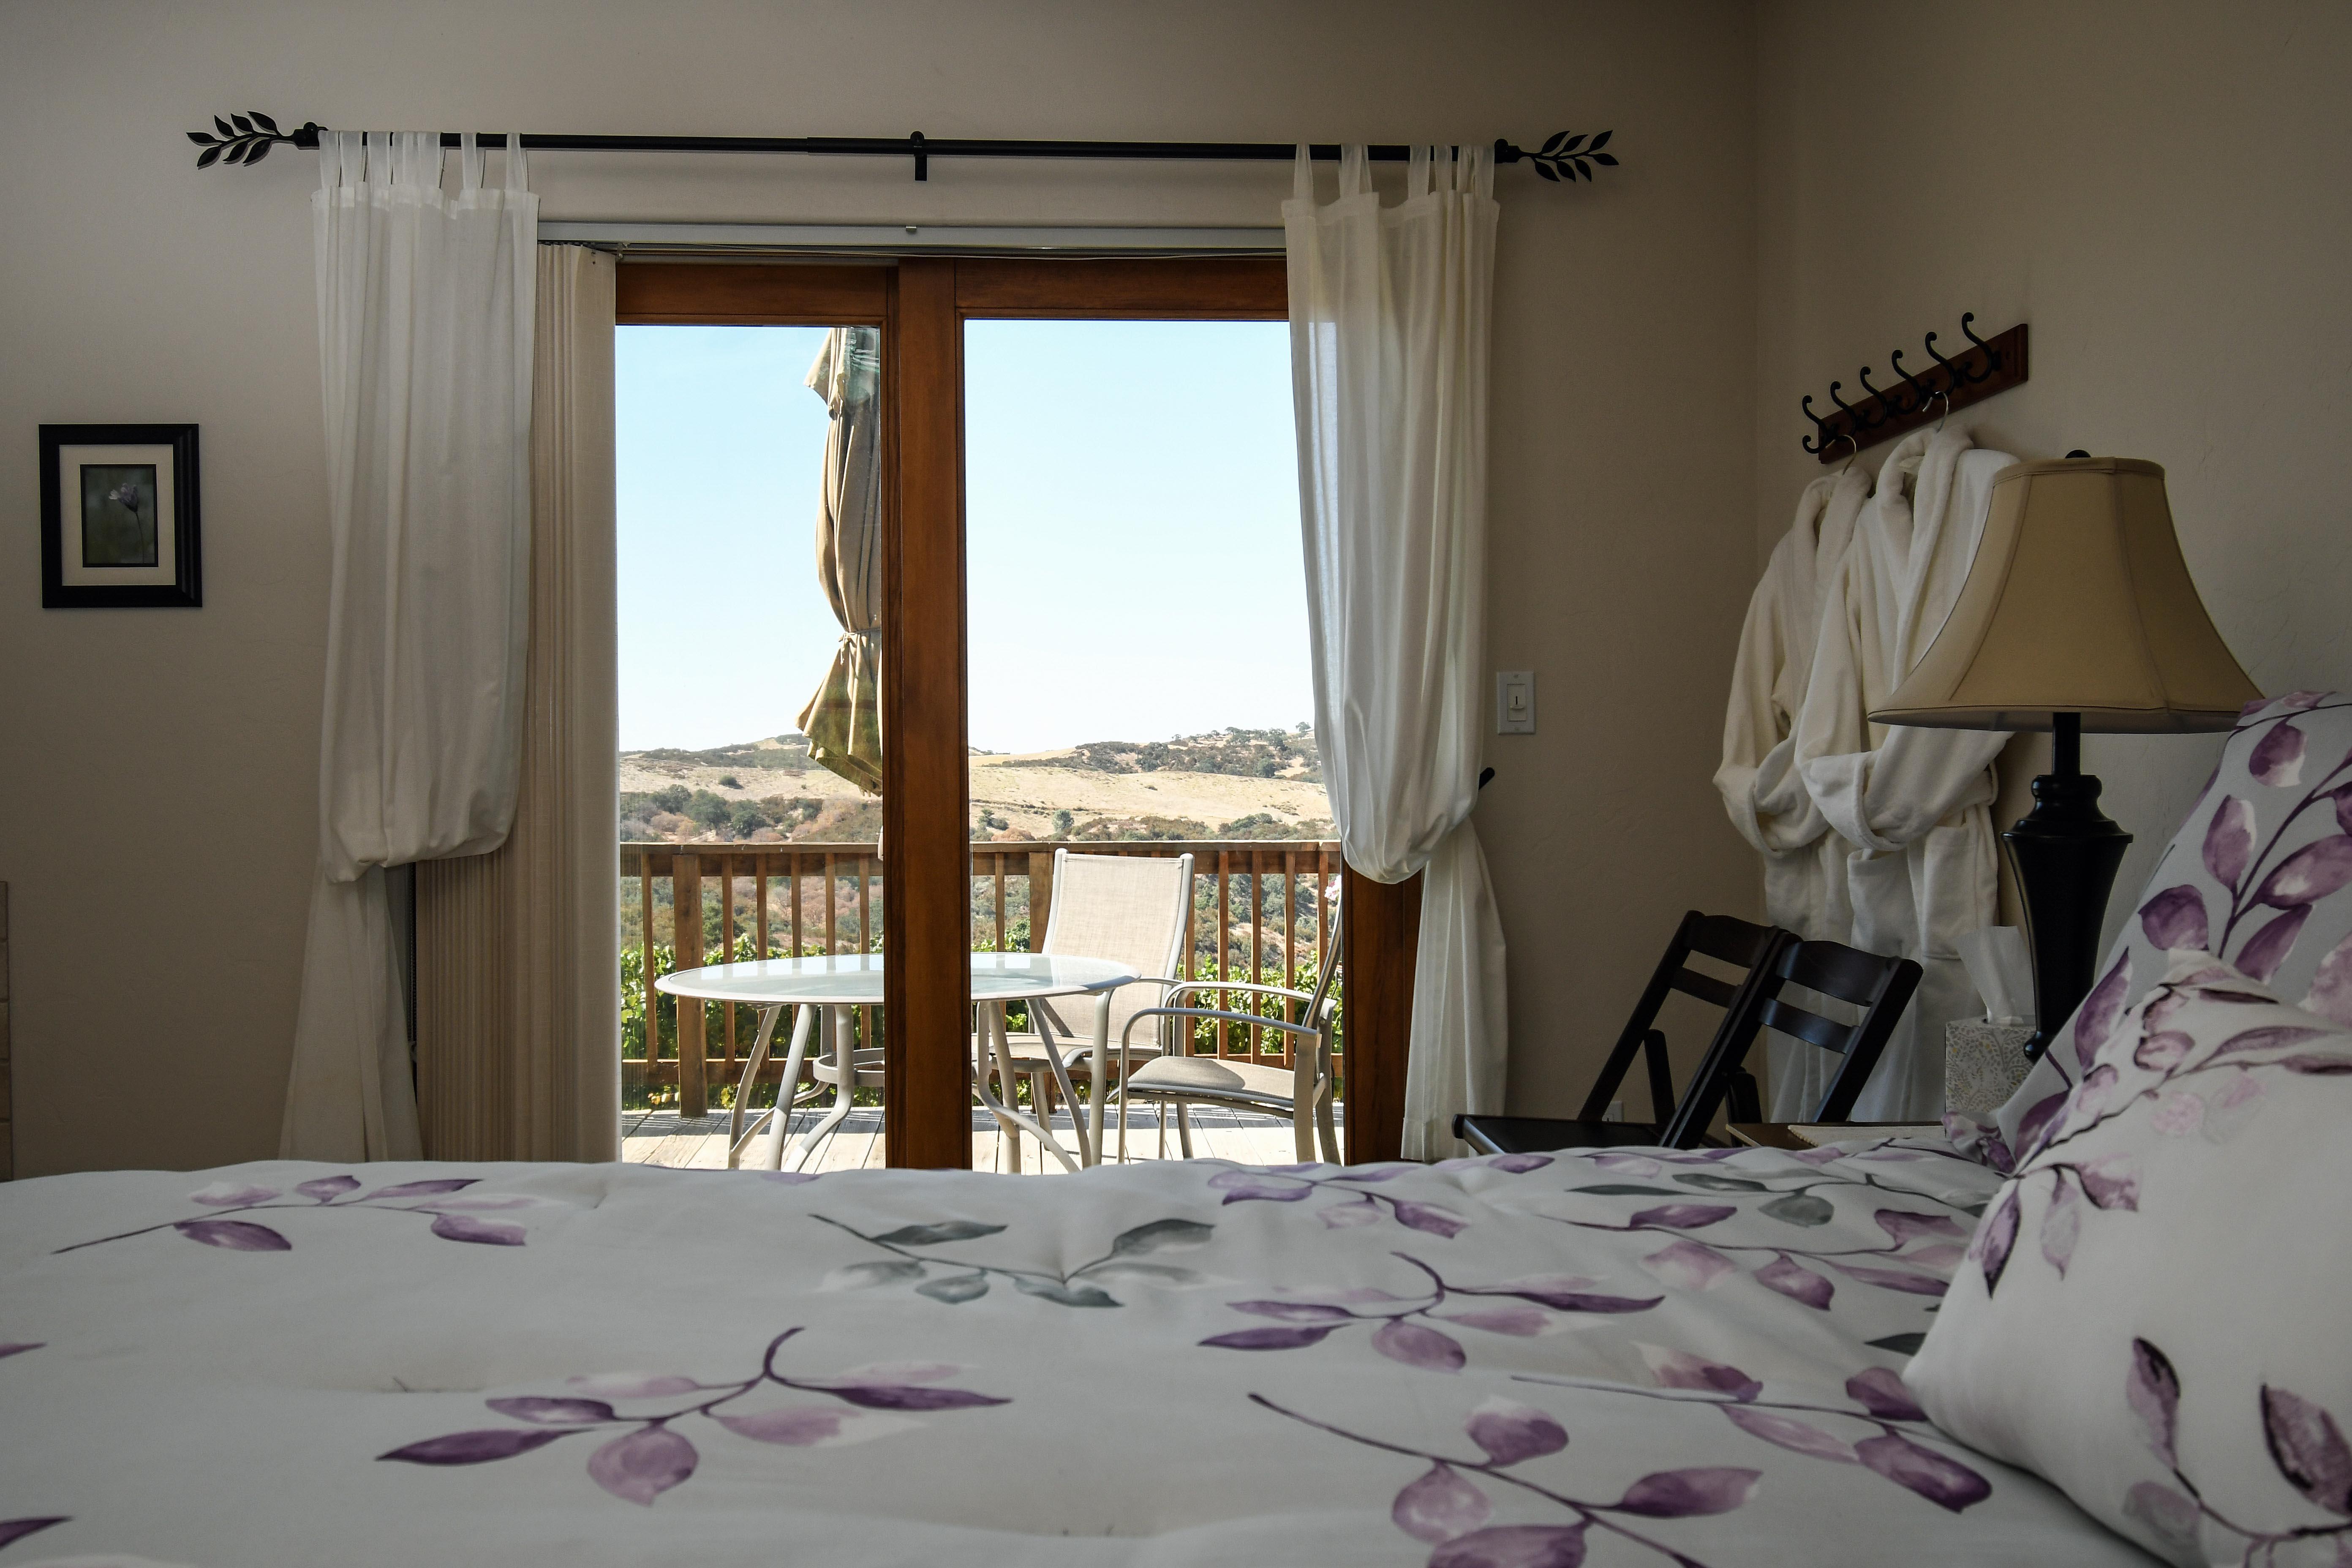 Manzanita Room 2 | Luxury Bed and Breakfast Inn